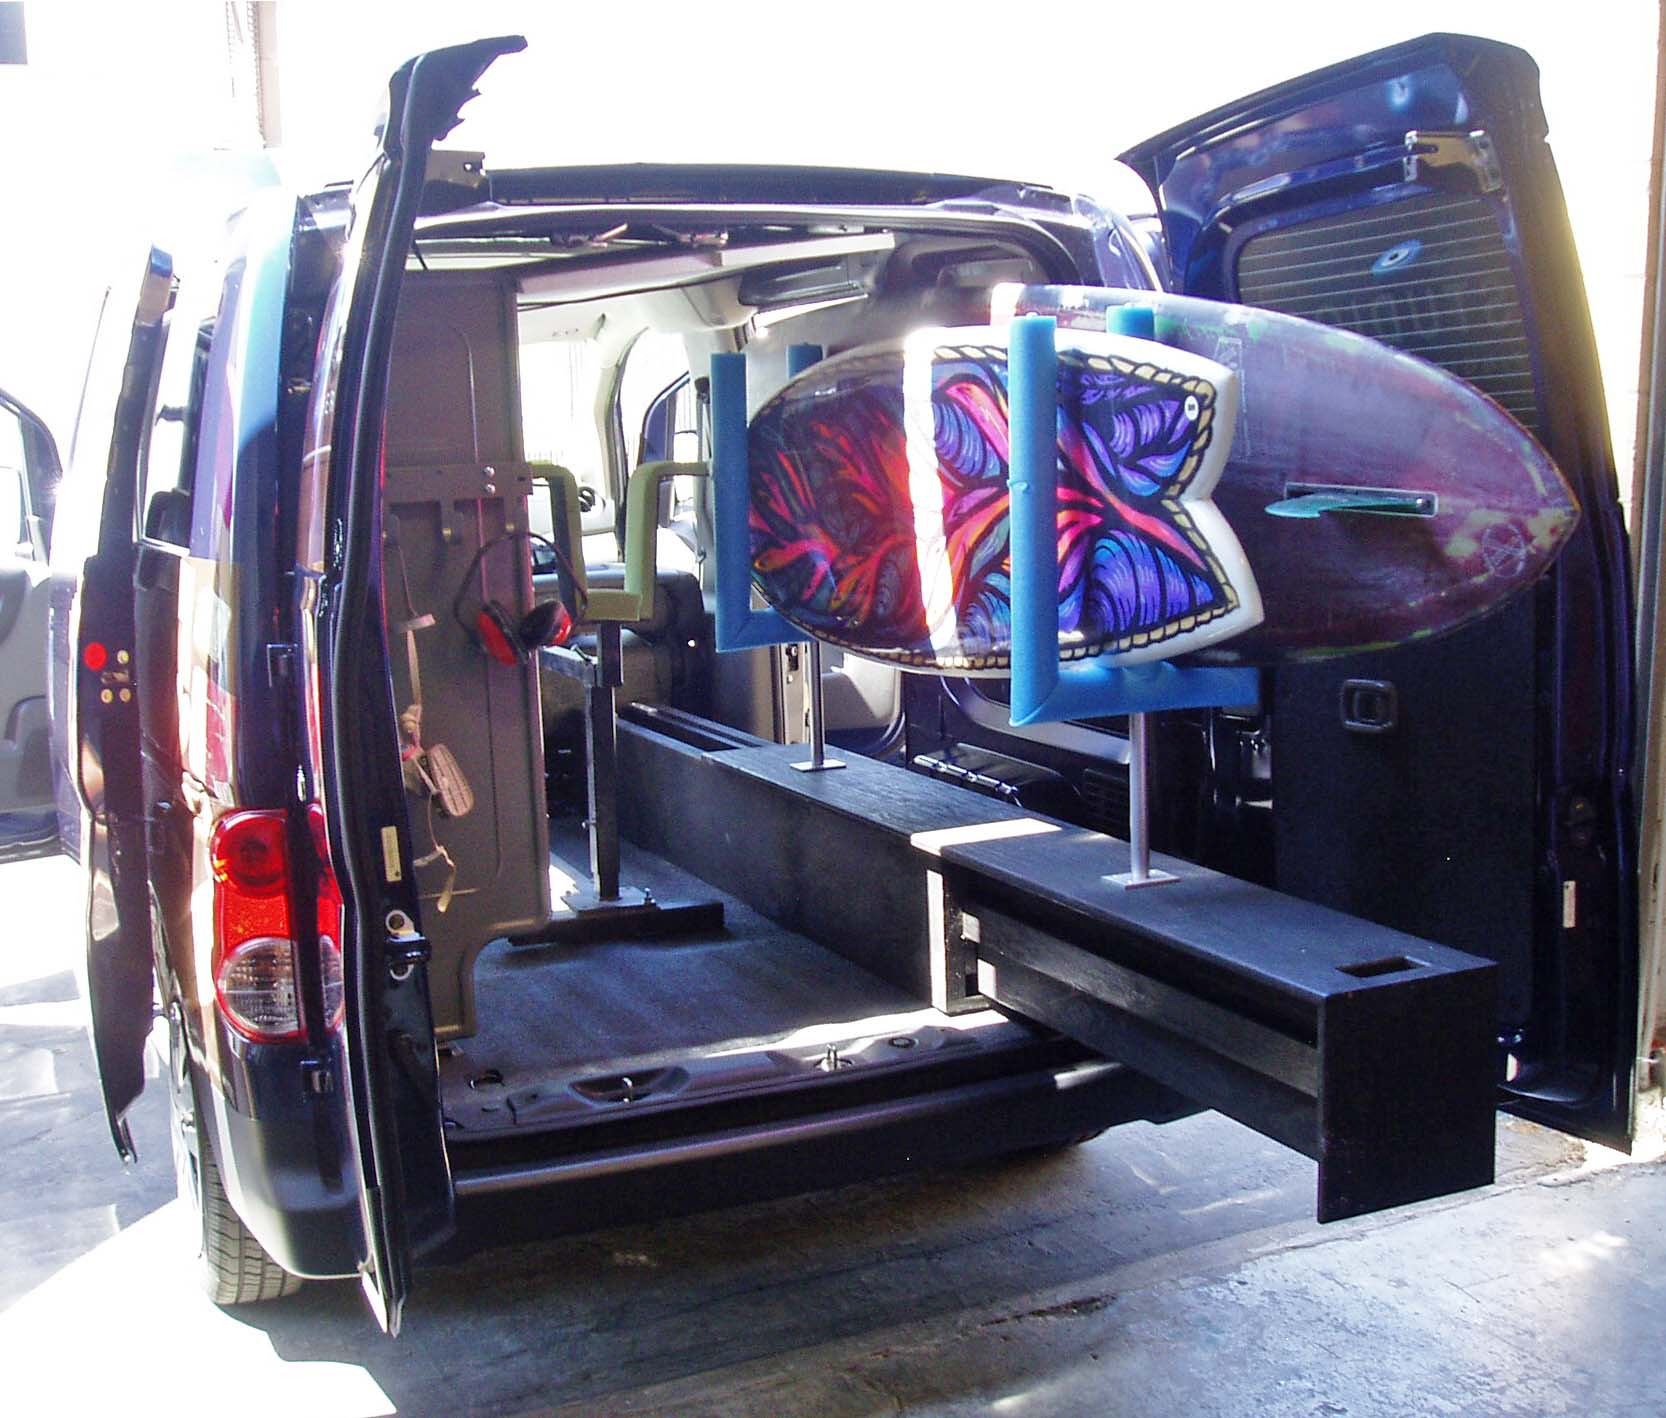 2017 Nissan Nv200 Suspension: 2013 Nissan NV200 Compact Cargo Van Test Drive